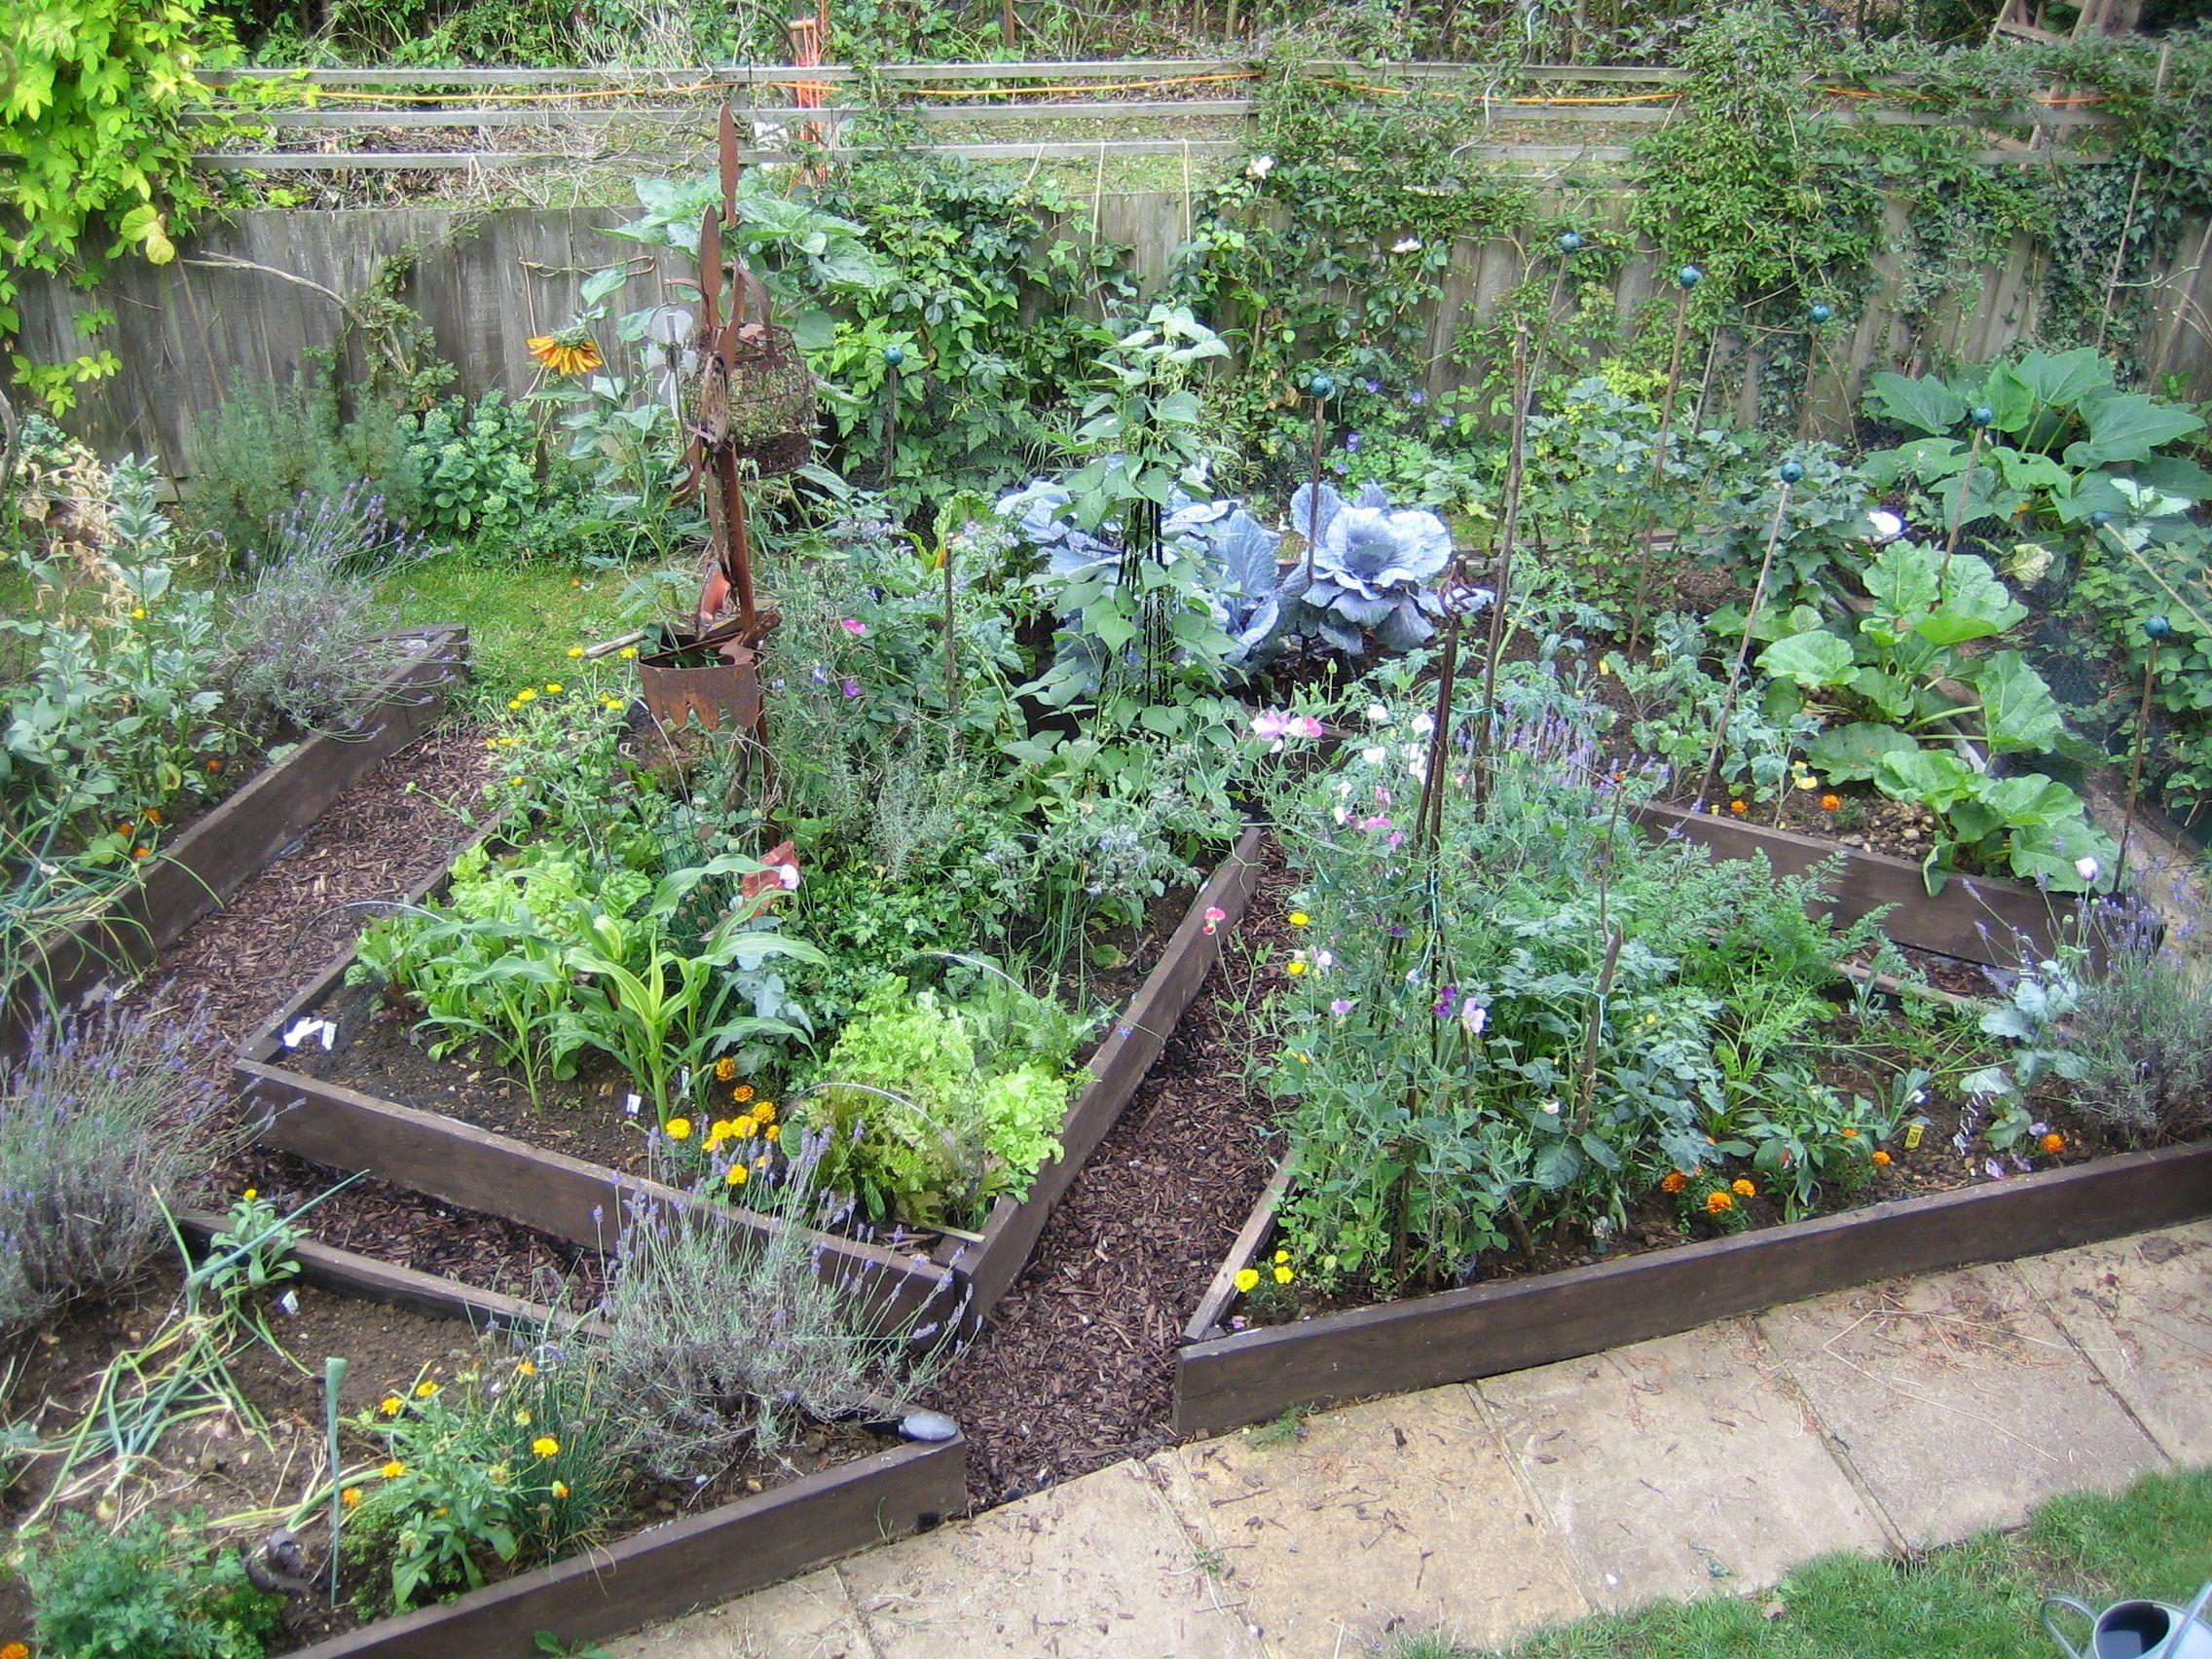 potager garden layout | Potager Designs - Elaine Christian ...